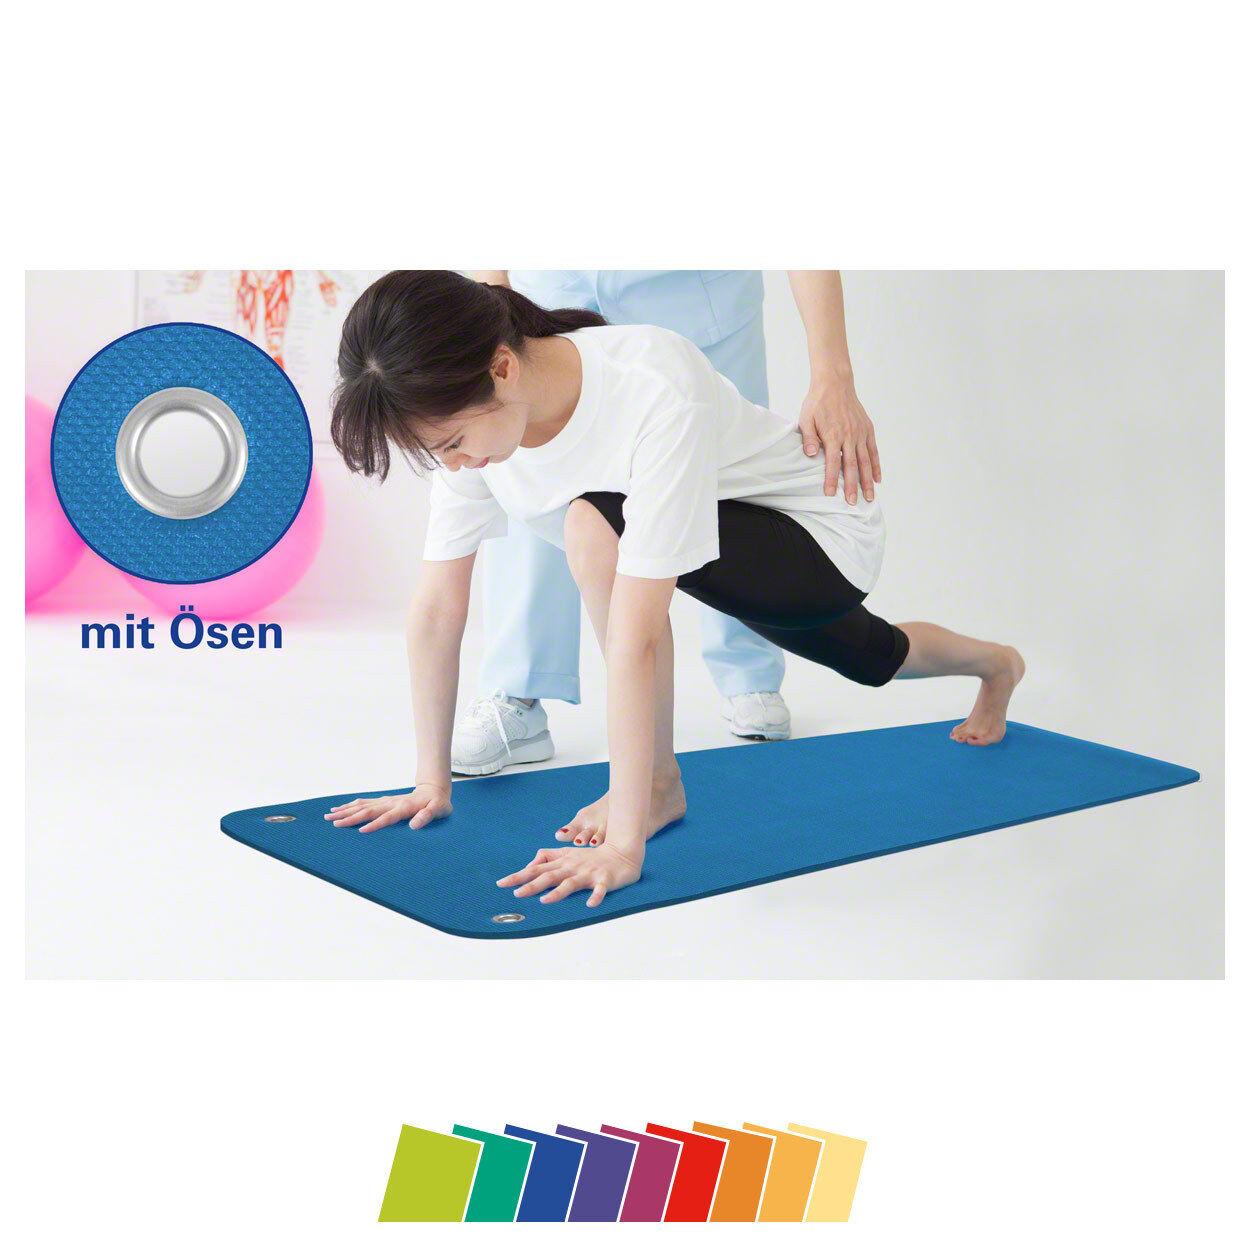 Sport-Tec Therapiematte inkl. Ösen LxBxH 140x60x1 5 cm